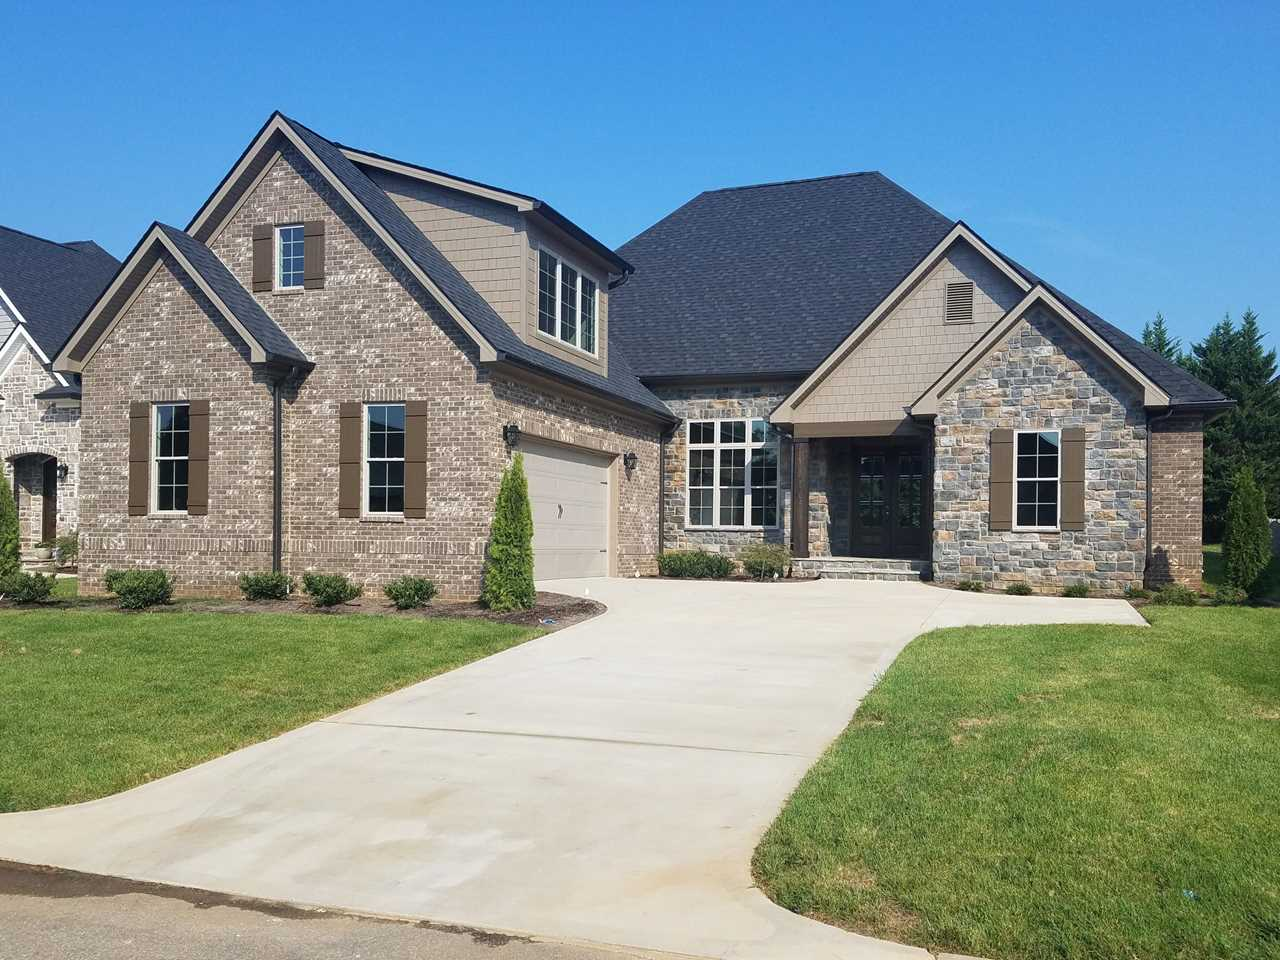 12832 Edgebrook Way Knoxville, TN 37922 | MLS 1080442 Photo 1